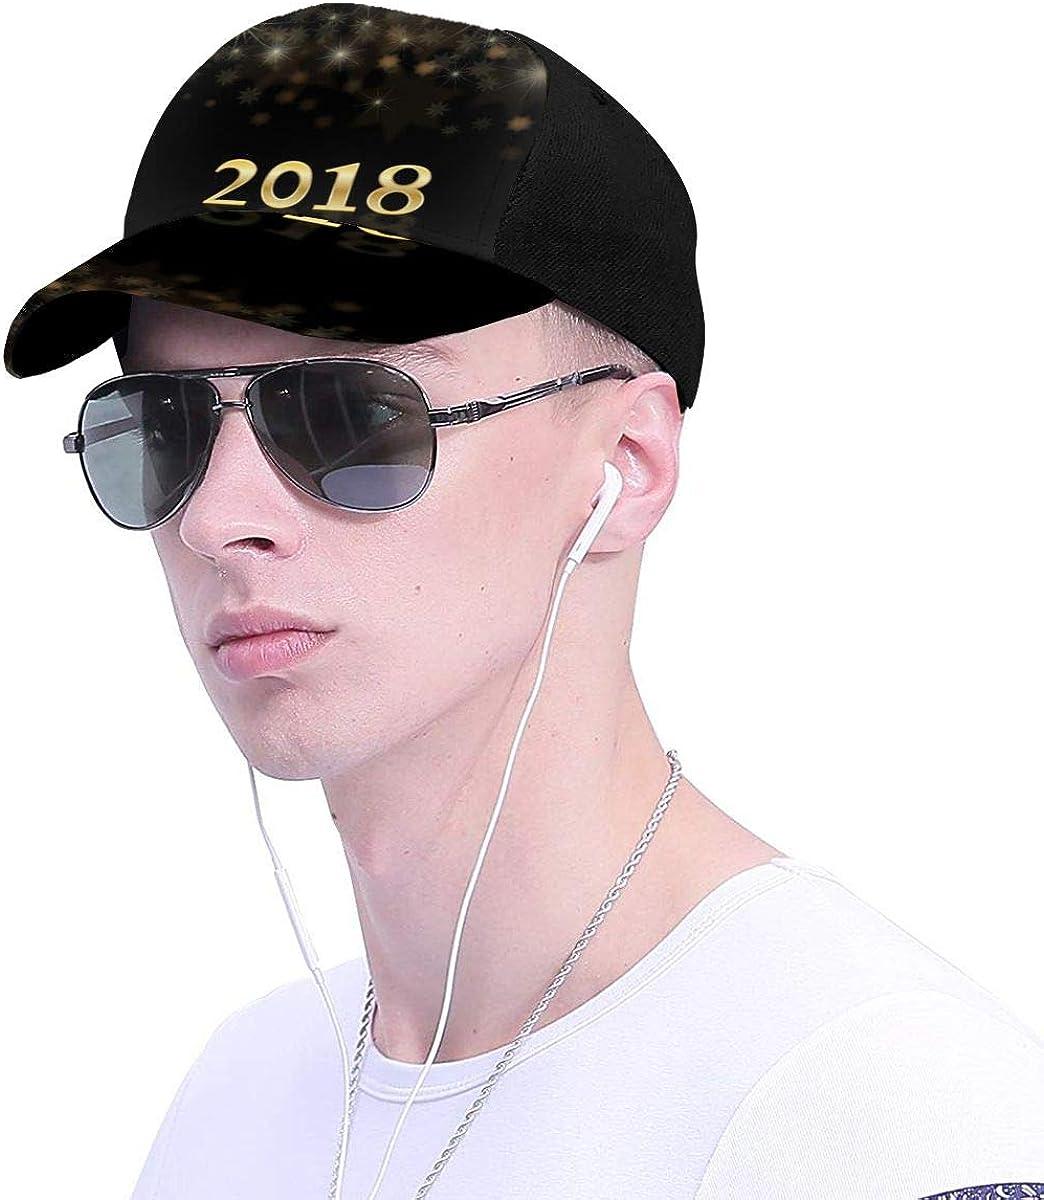 New Year 2018 Glitter Classic Baseball Cap Men Women Dad Hat Twill Adjustable Size Black